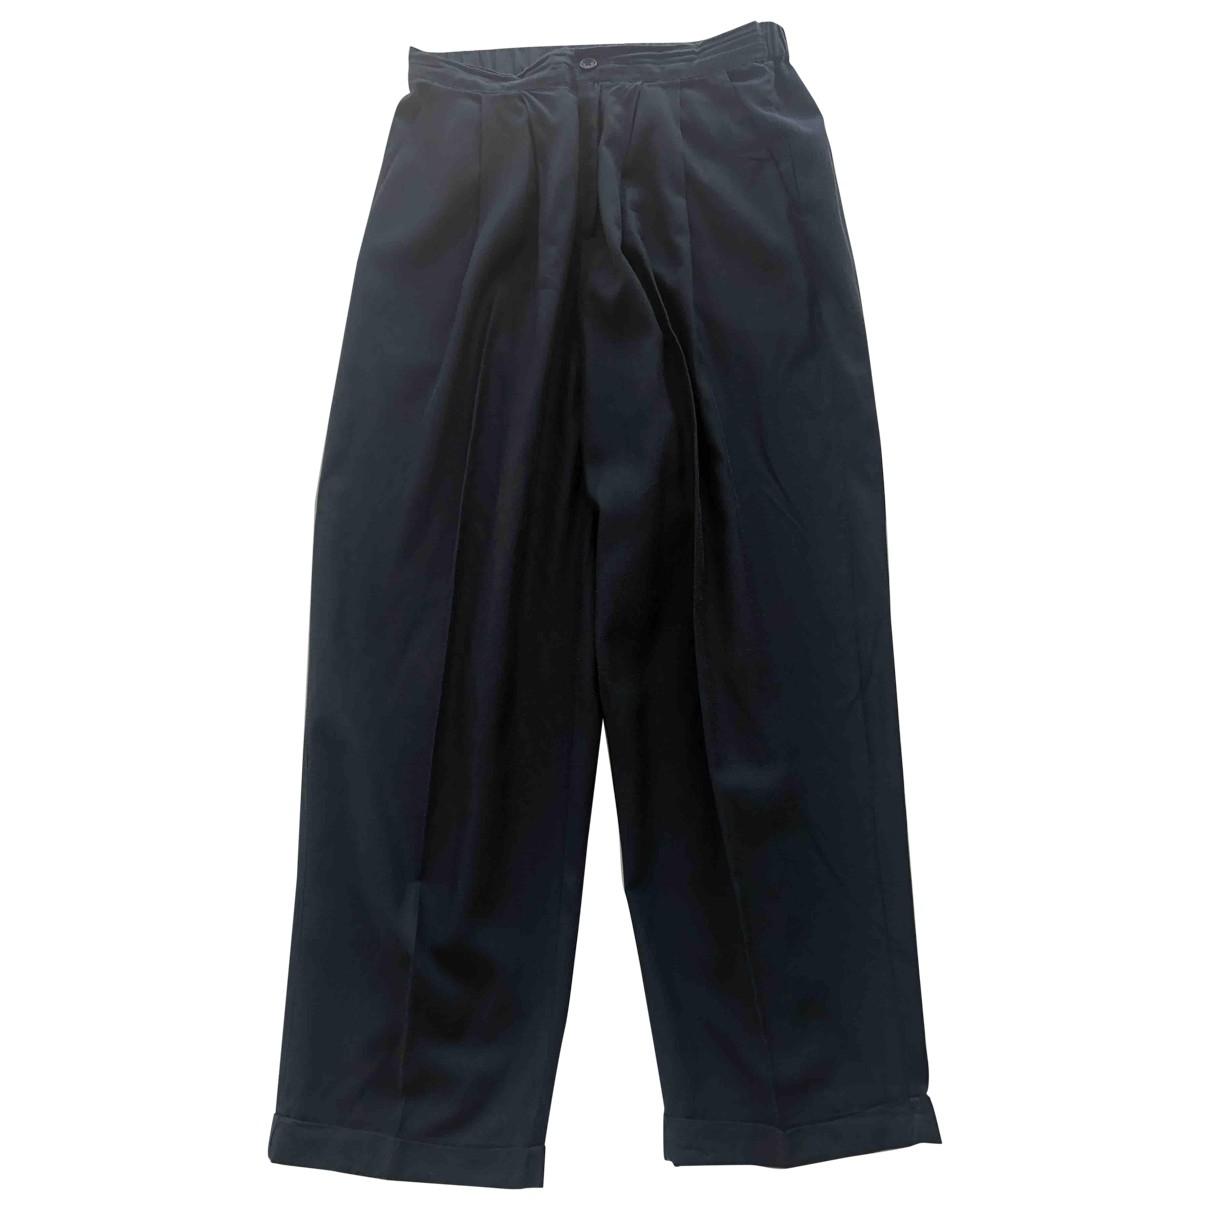 American Vintage \N Blue Trousers for Women S International